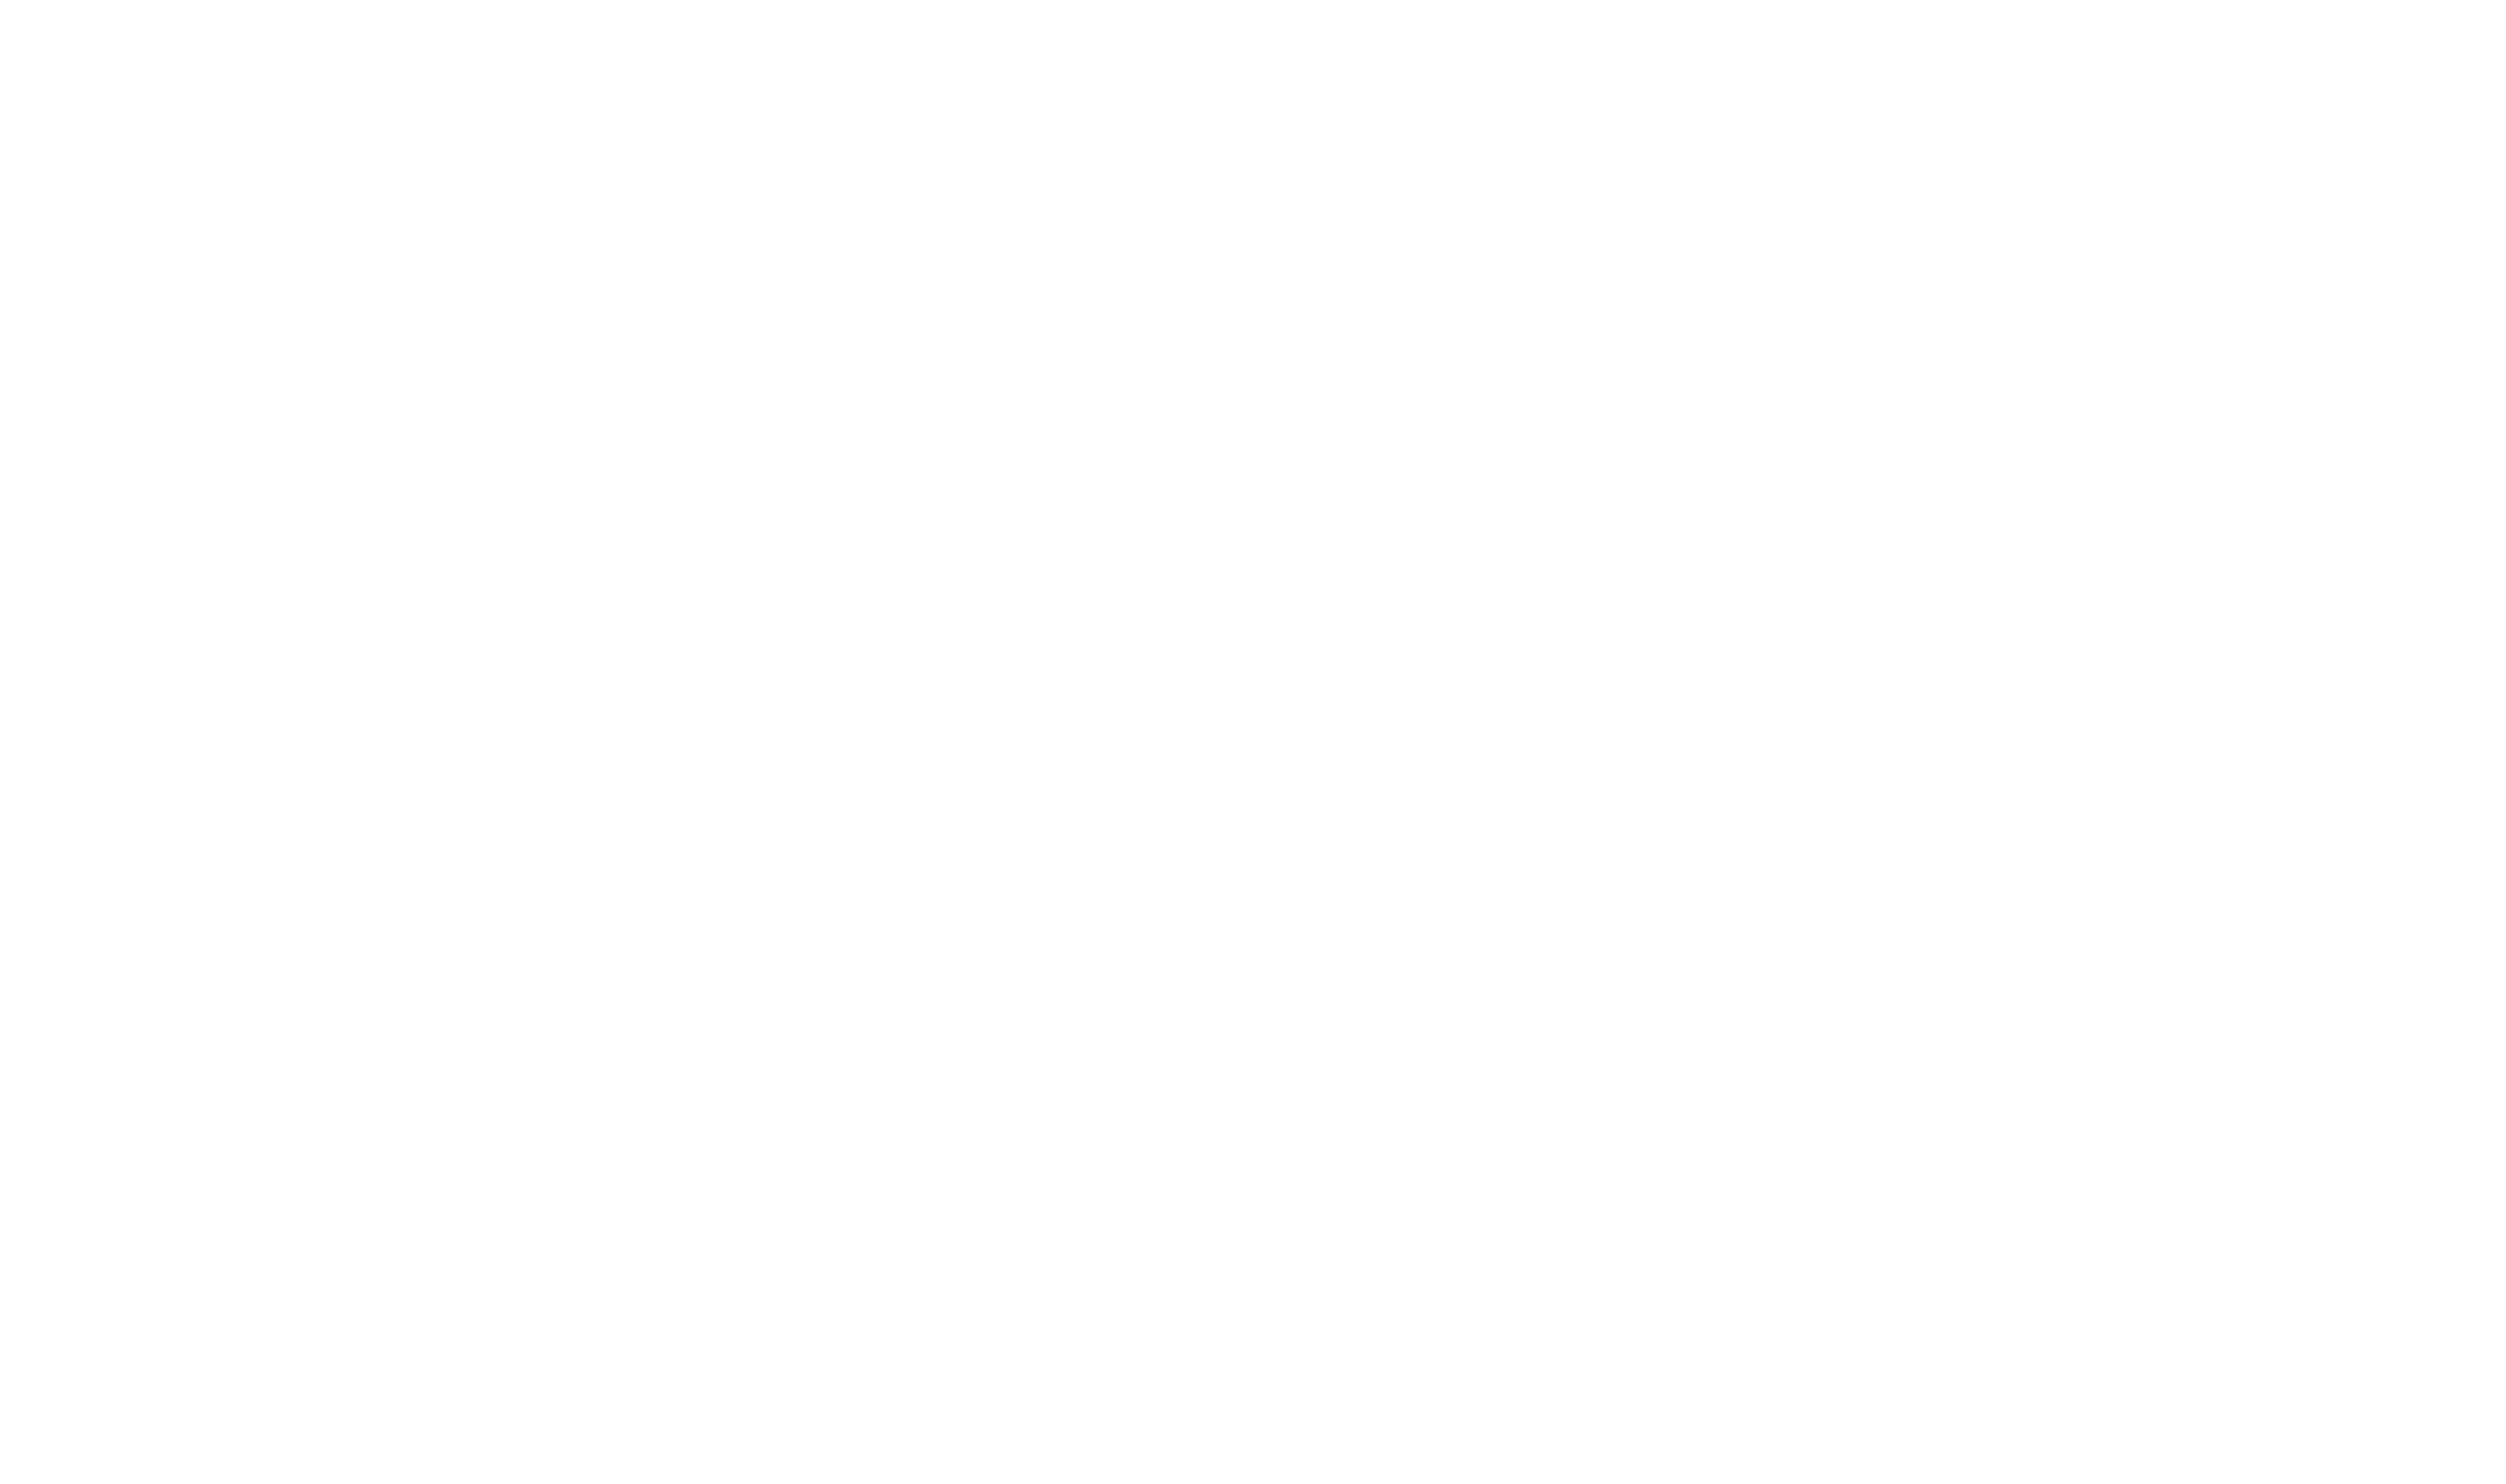 Piemans Pantry